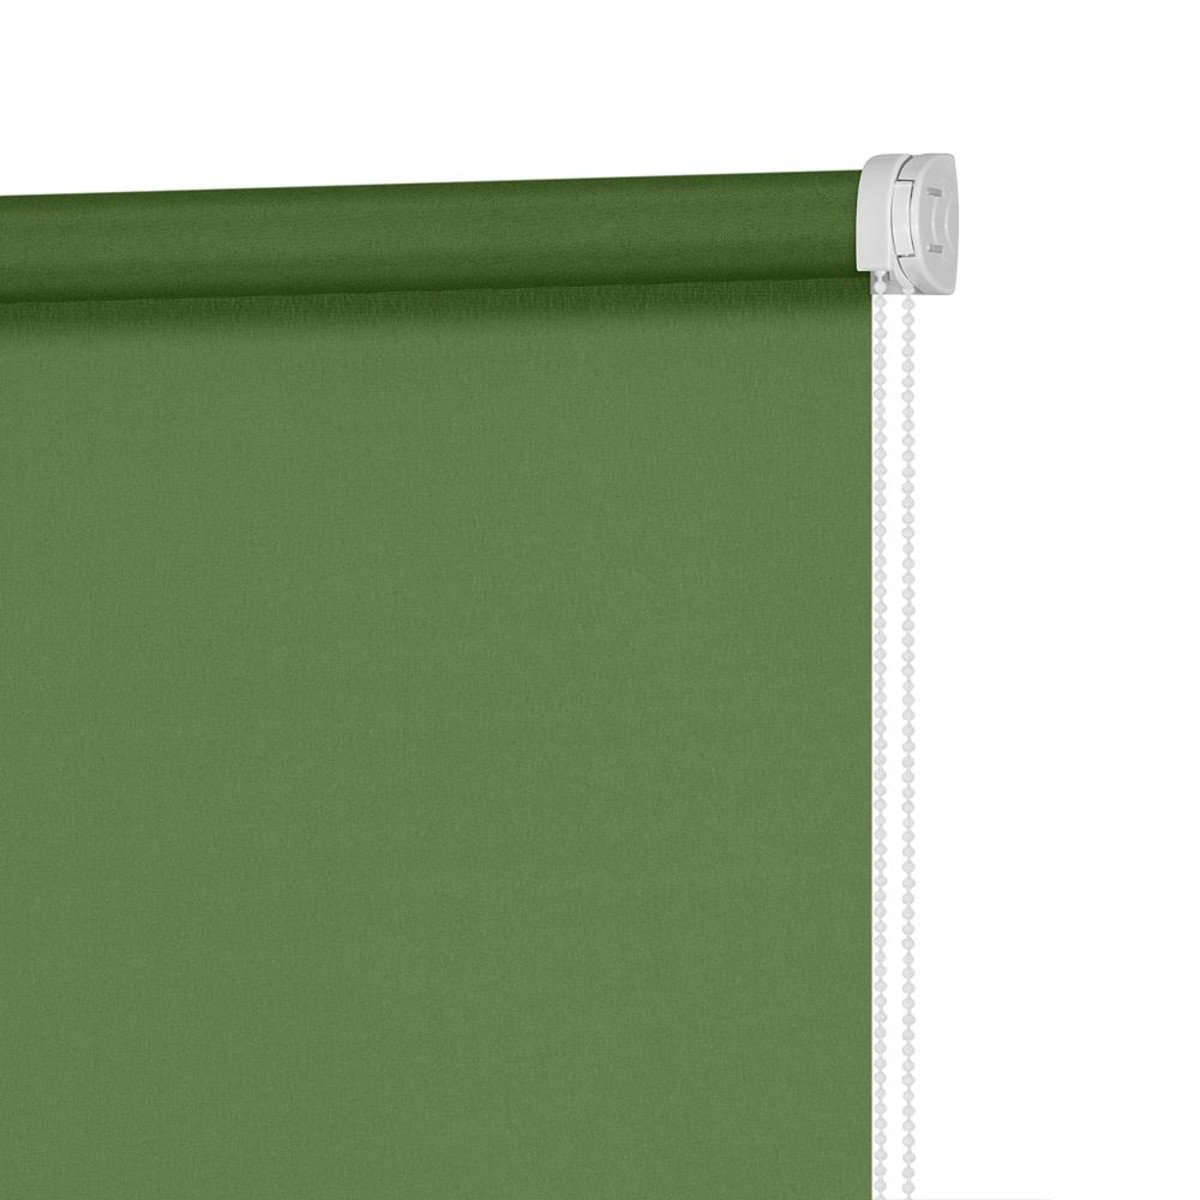 Рулонная Ора Decofest Плайн 140Х175 Цвет Зеленый